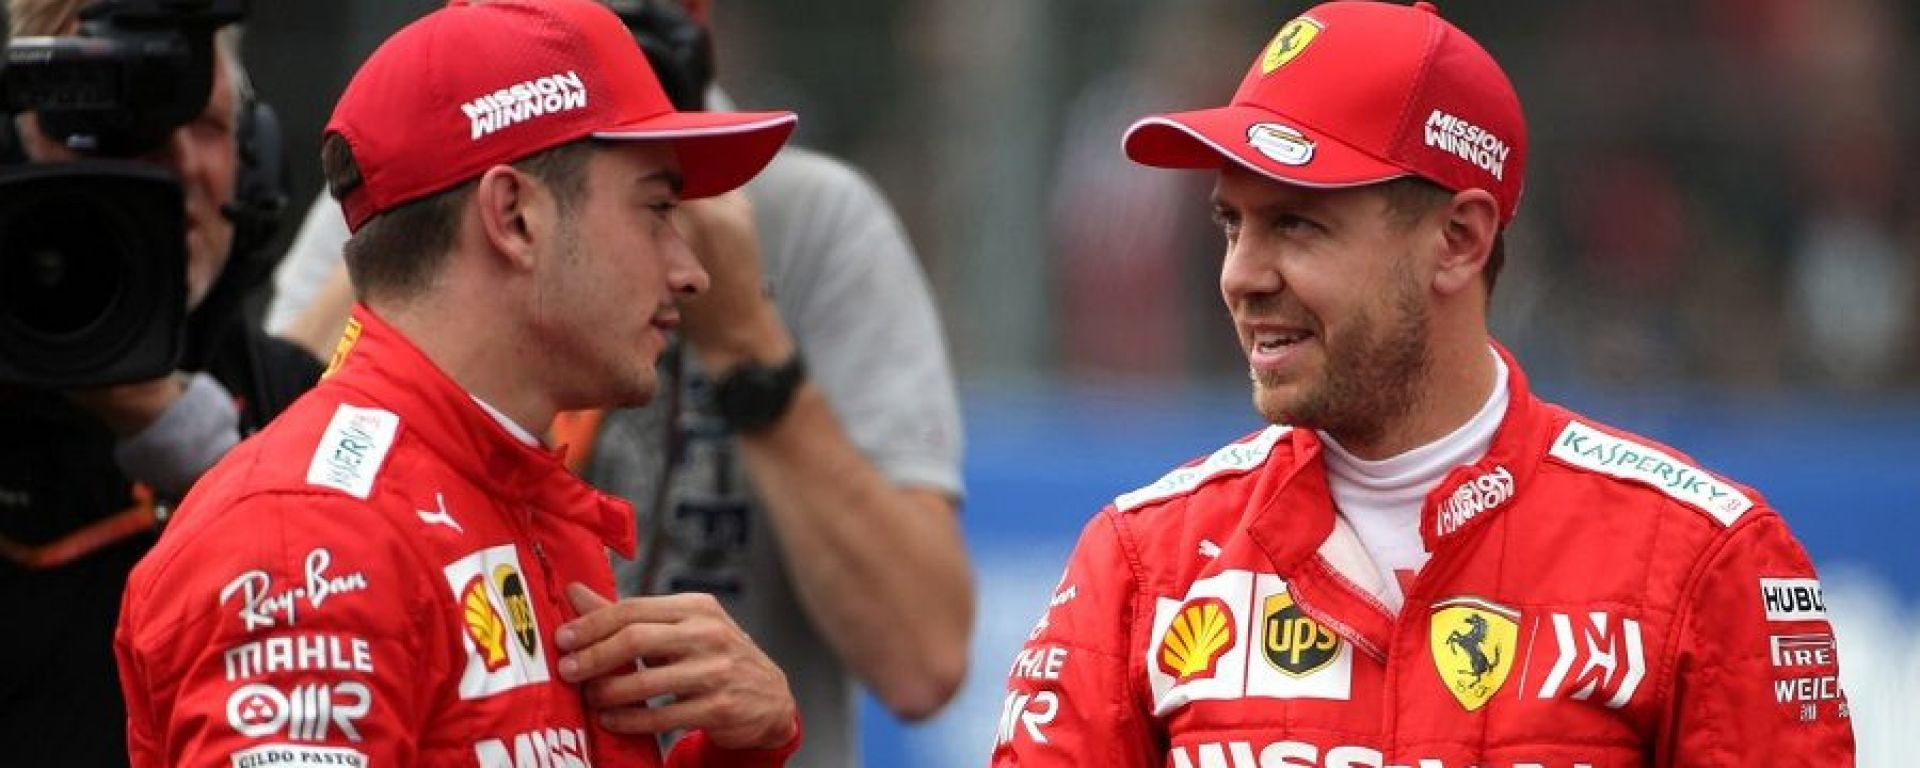 F1 2019: Charles Leclerc e Sebastian Vettel (Ferrari)